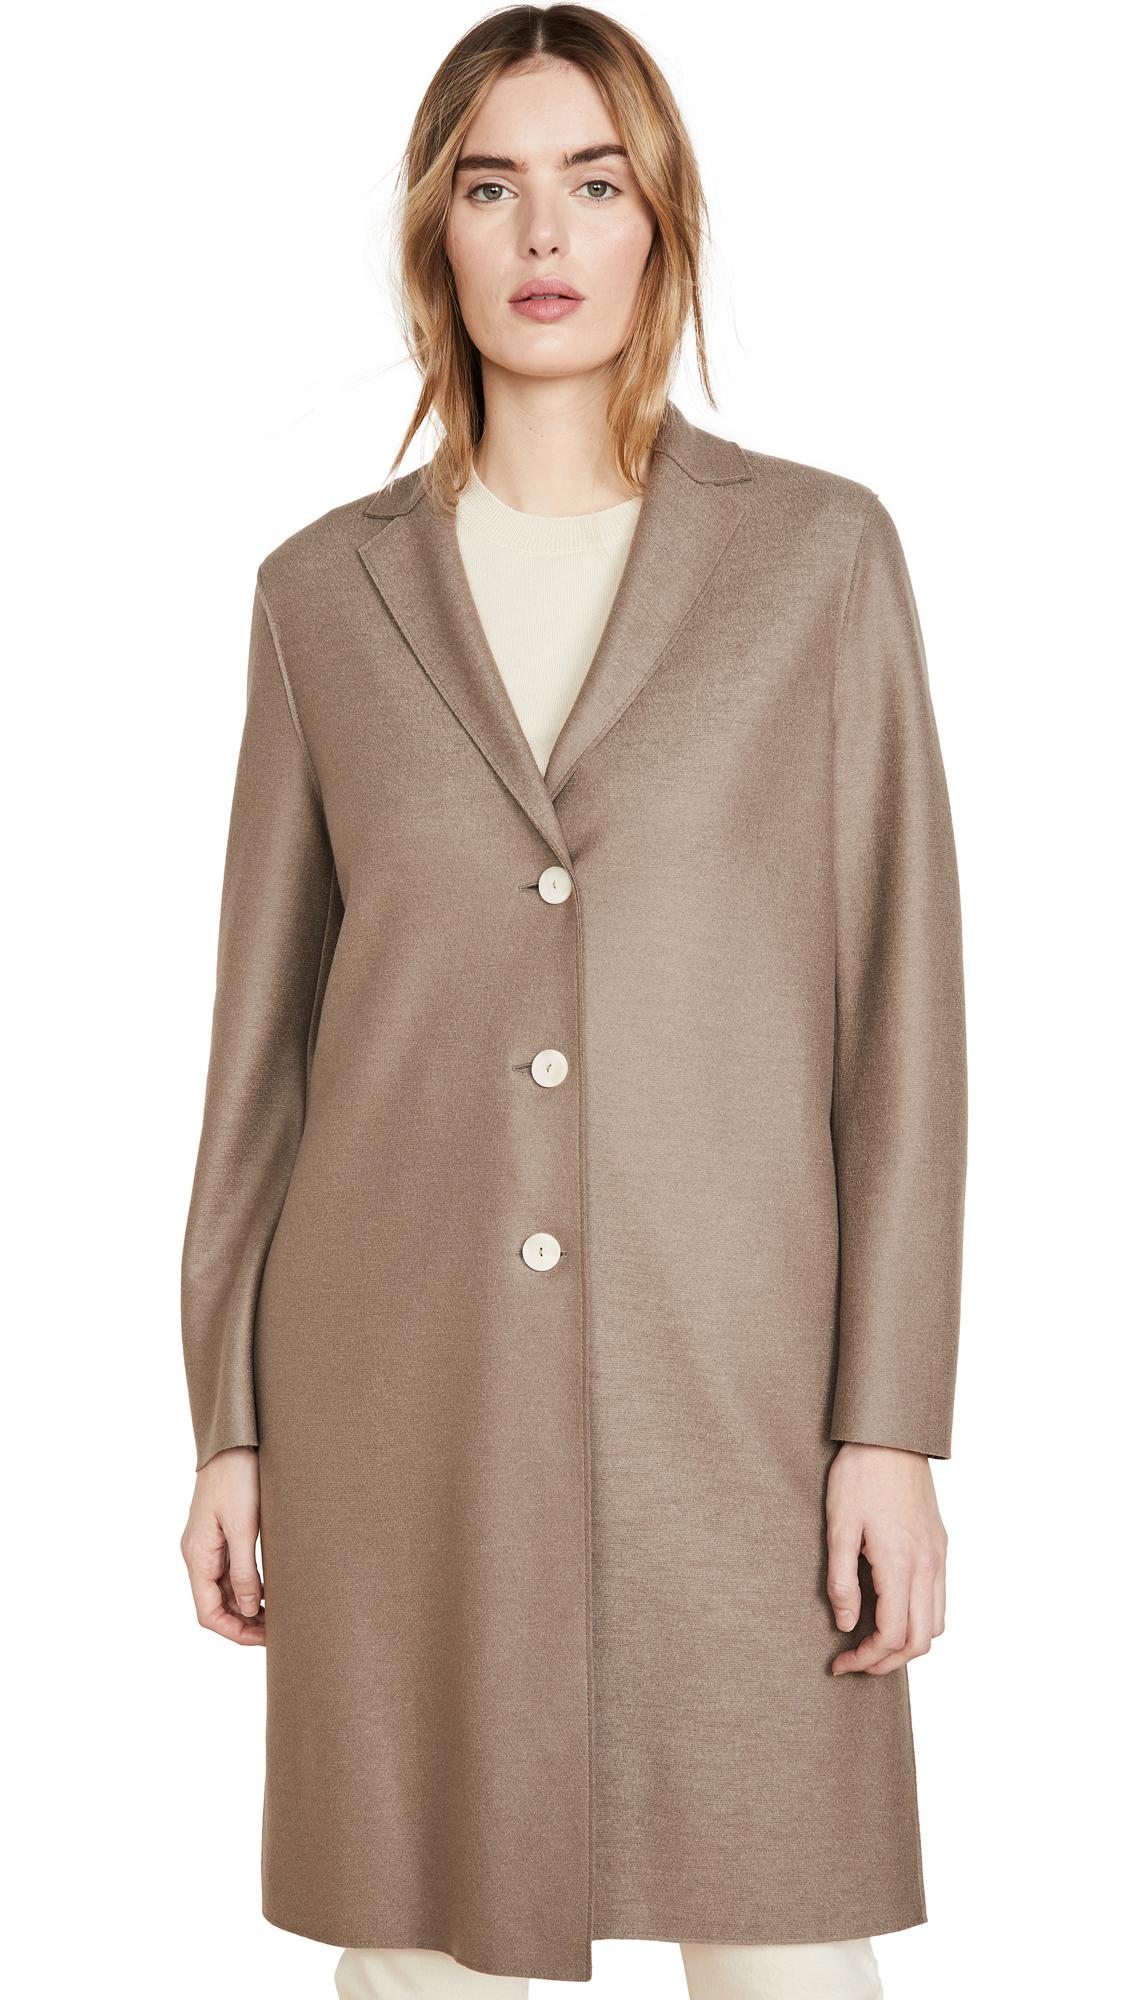 Buy Harris Wharf London Overcoat Light Pressed Wool Jacket online beautiful Harris Wharf London Clothing, Jackets